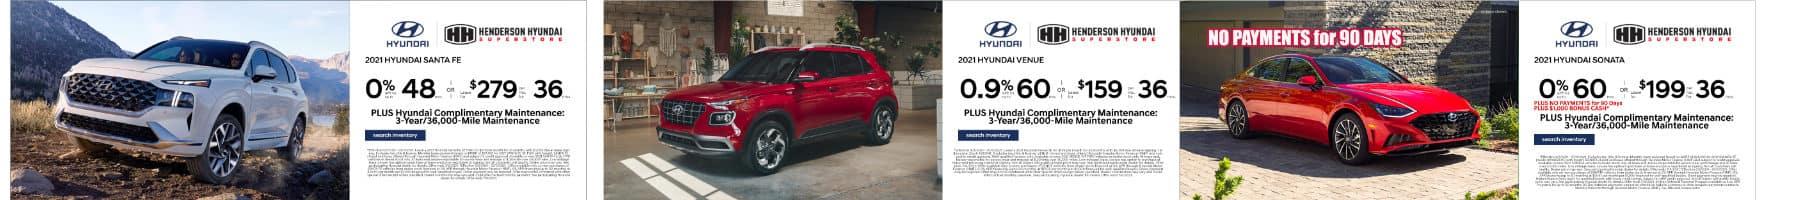 HendersonHyundai_VRP_1800x200_June_2021_v2